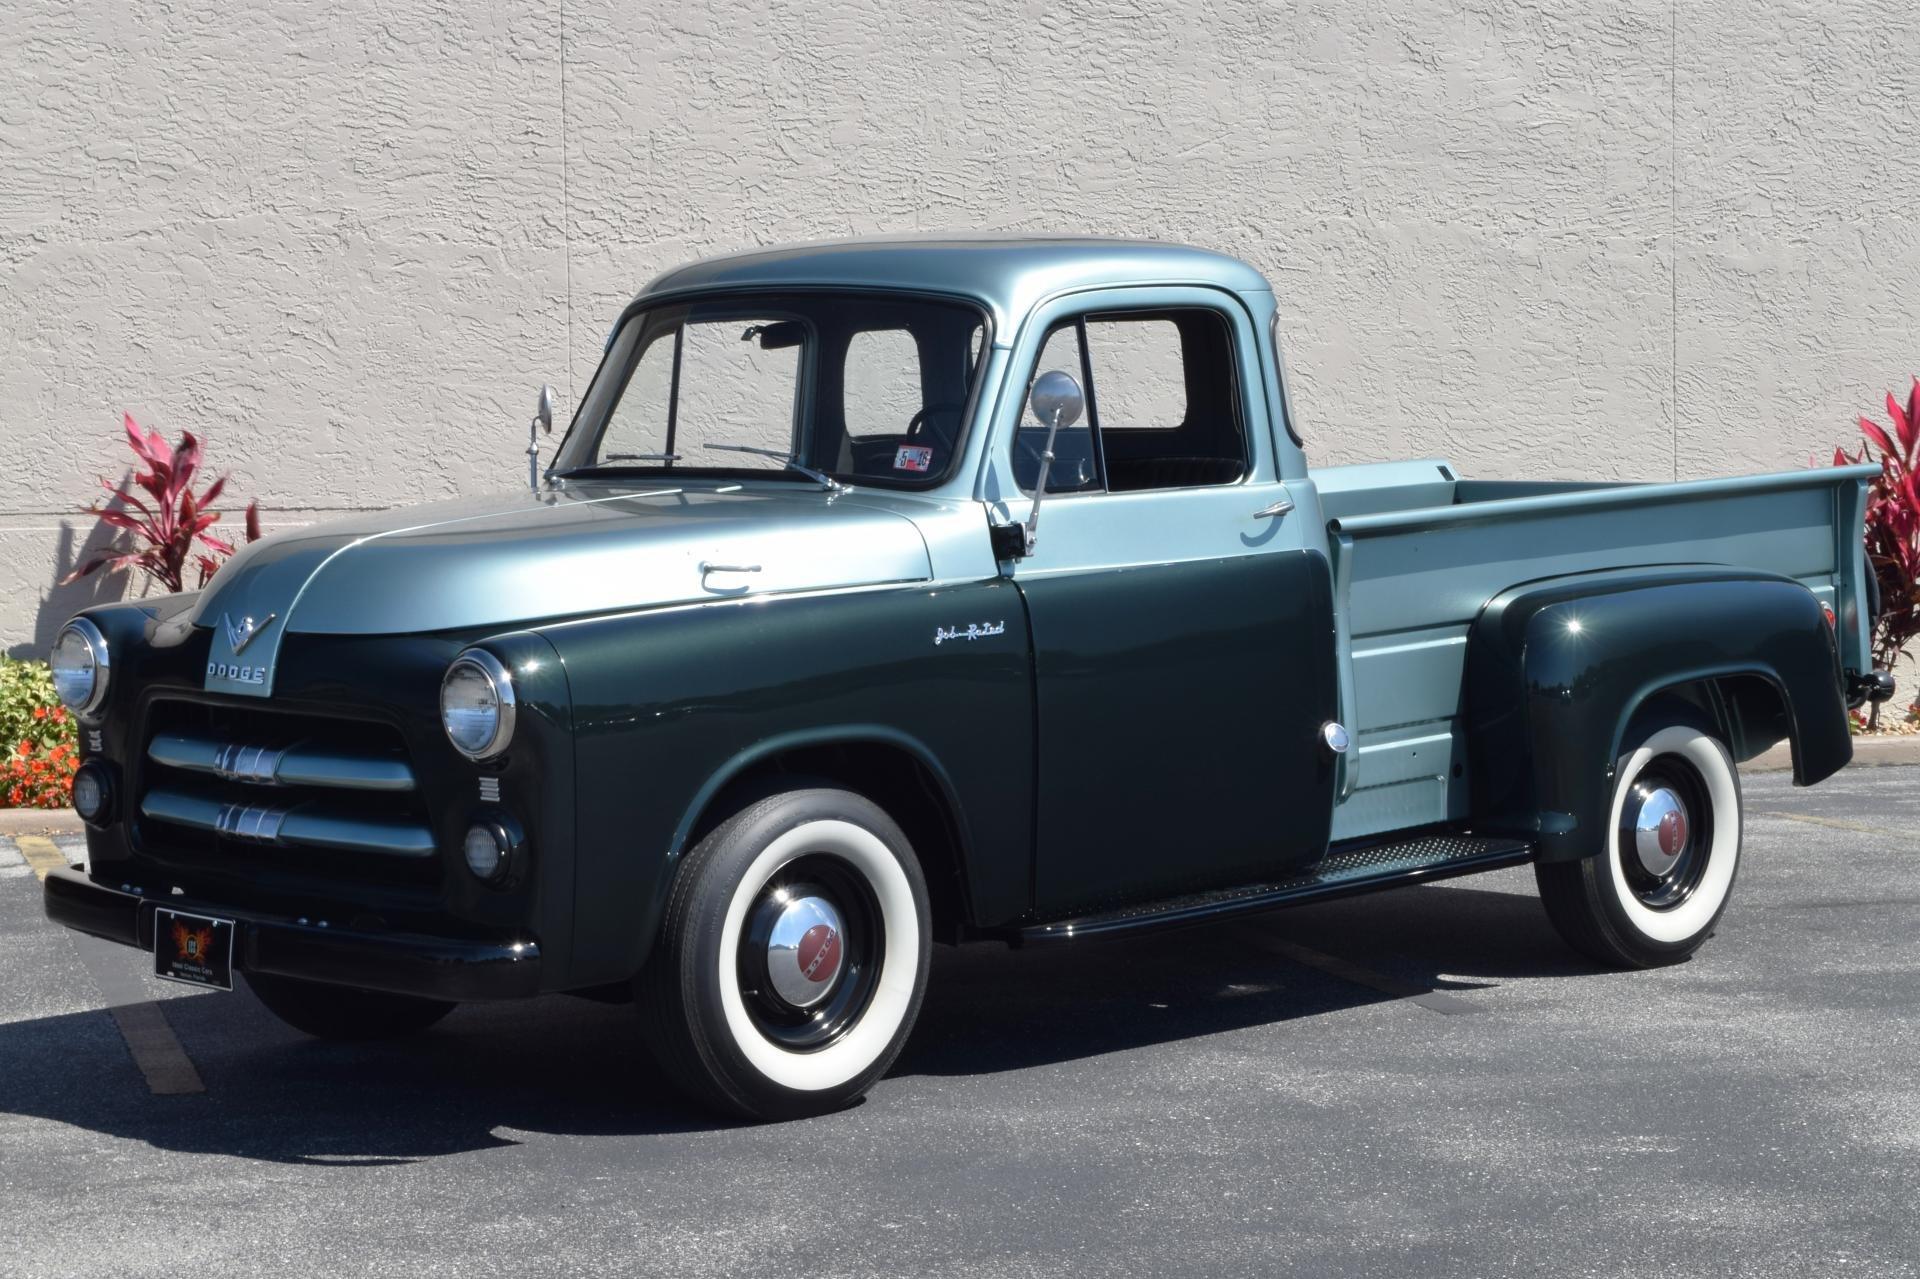 1955 dodge job rated rare red ram hemi pickup truck wallpaper 1920x1279 1066392 wallpaperup. Black Bedroom Furniture Sets. Home Design Ideas